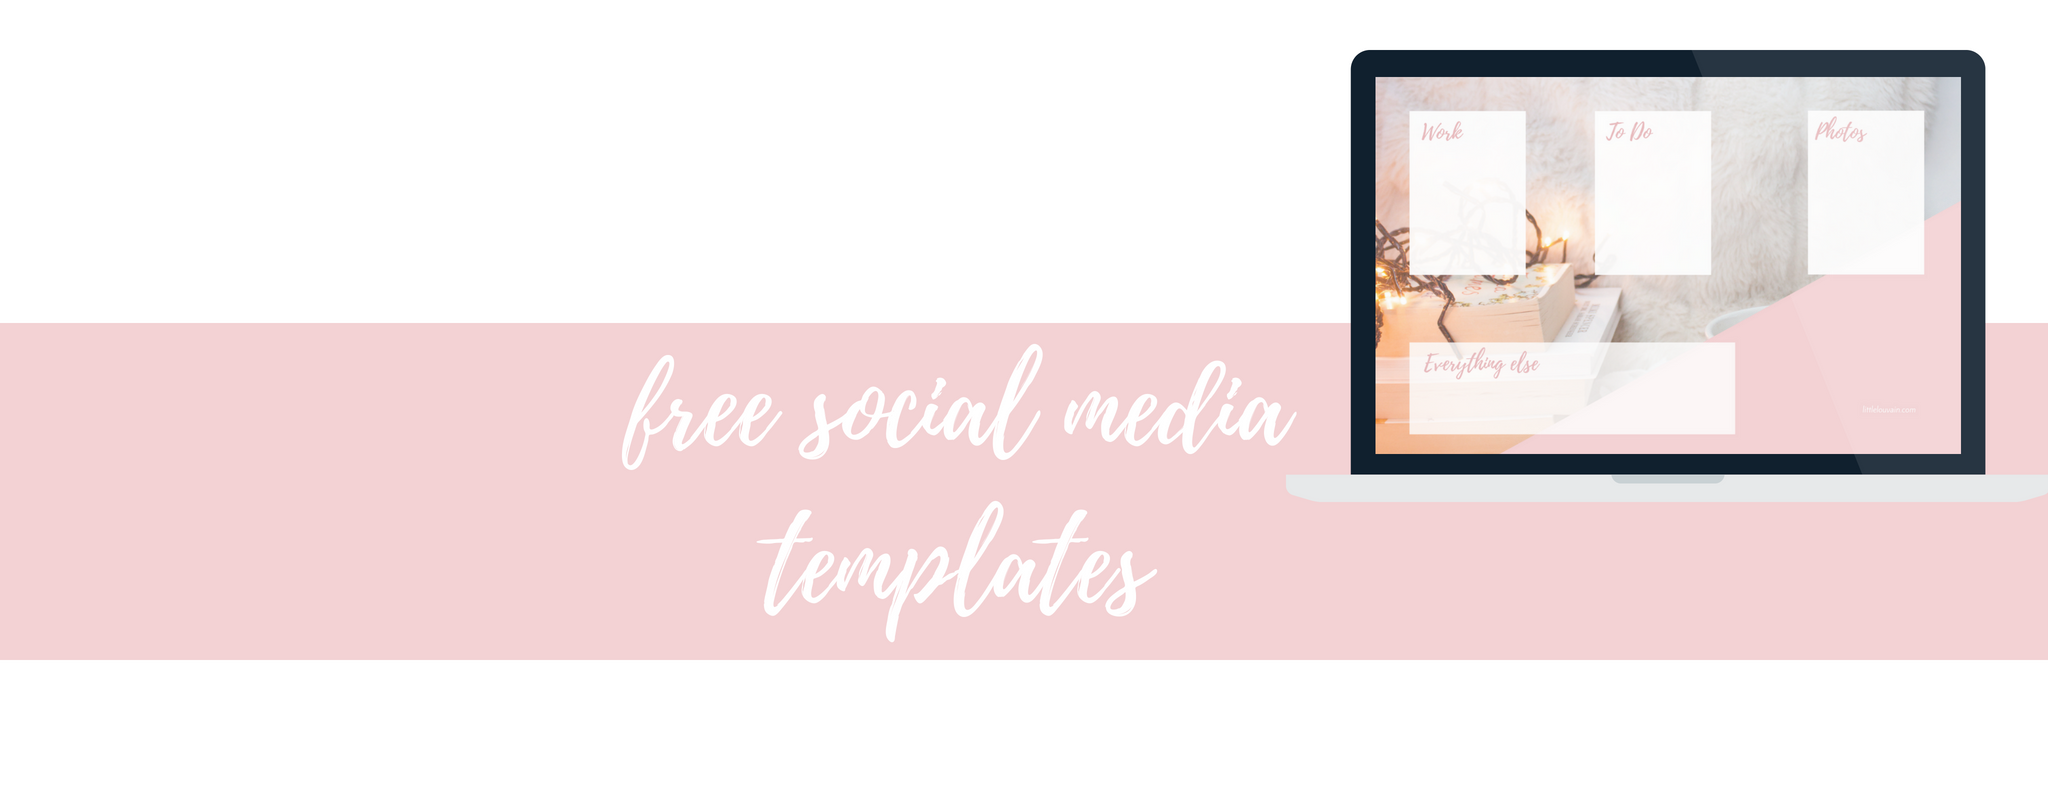 free social media templates